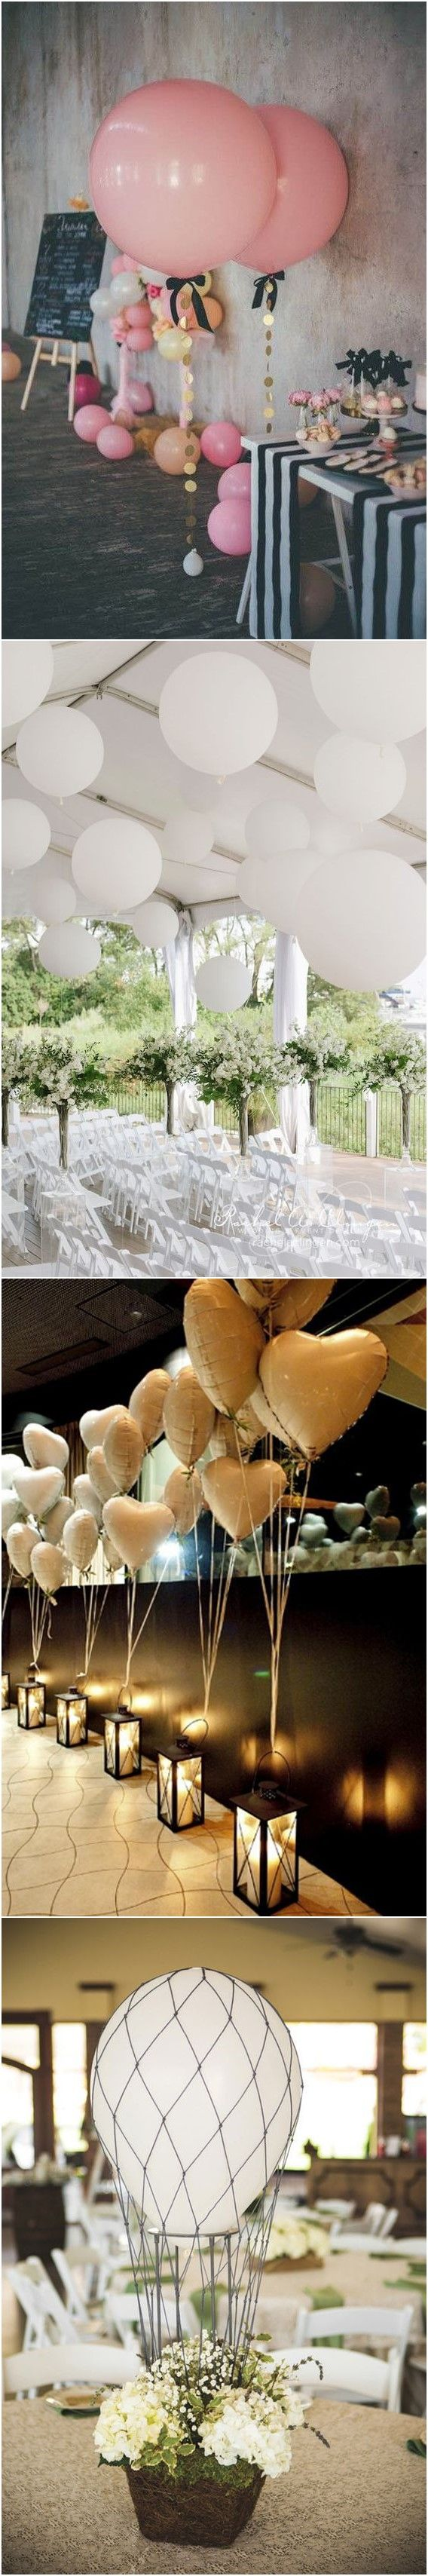 Wedding    Decorations » 24 Fun and Creative Balloon Wedding Decoration Ideas ❤️ More:    http://www.weddinginclude.com/2017/08/fun-and-creative-balloon-wedding-decoration-ideas/